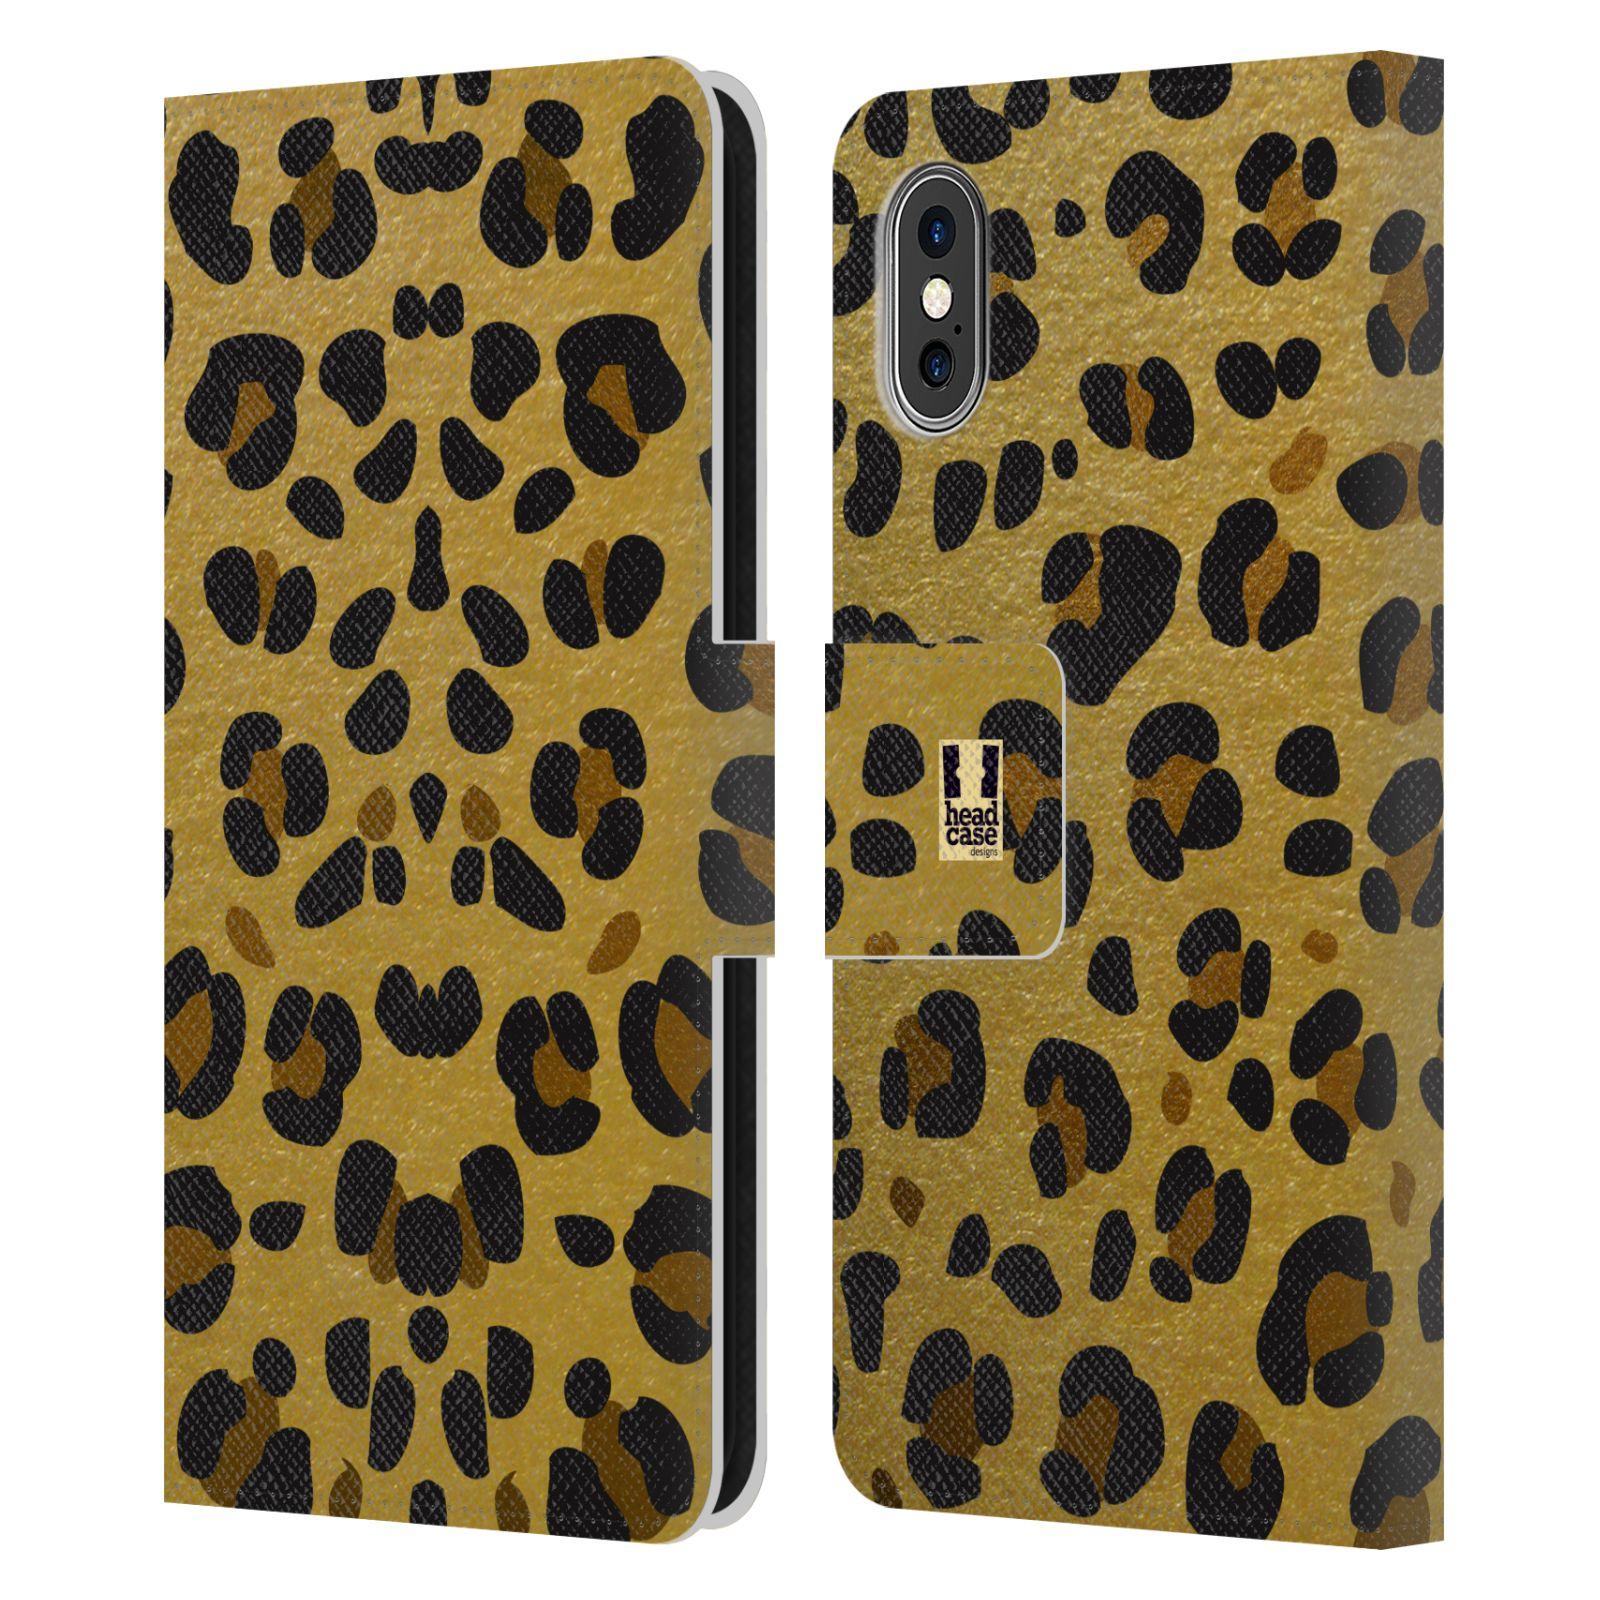 Pouzdro na mobil Apple Iphone X / XS - Head Case - Fashion zvířecí vzor